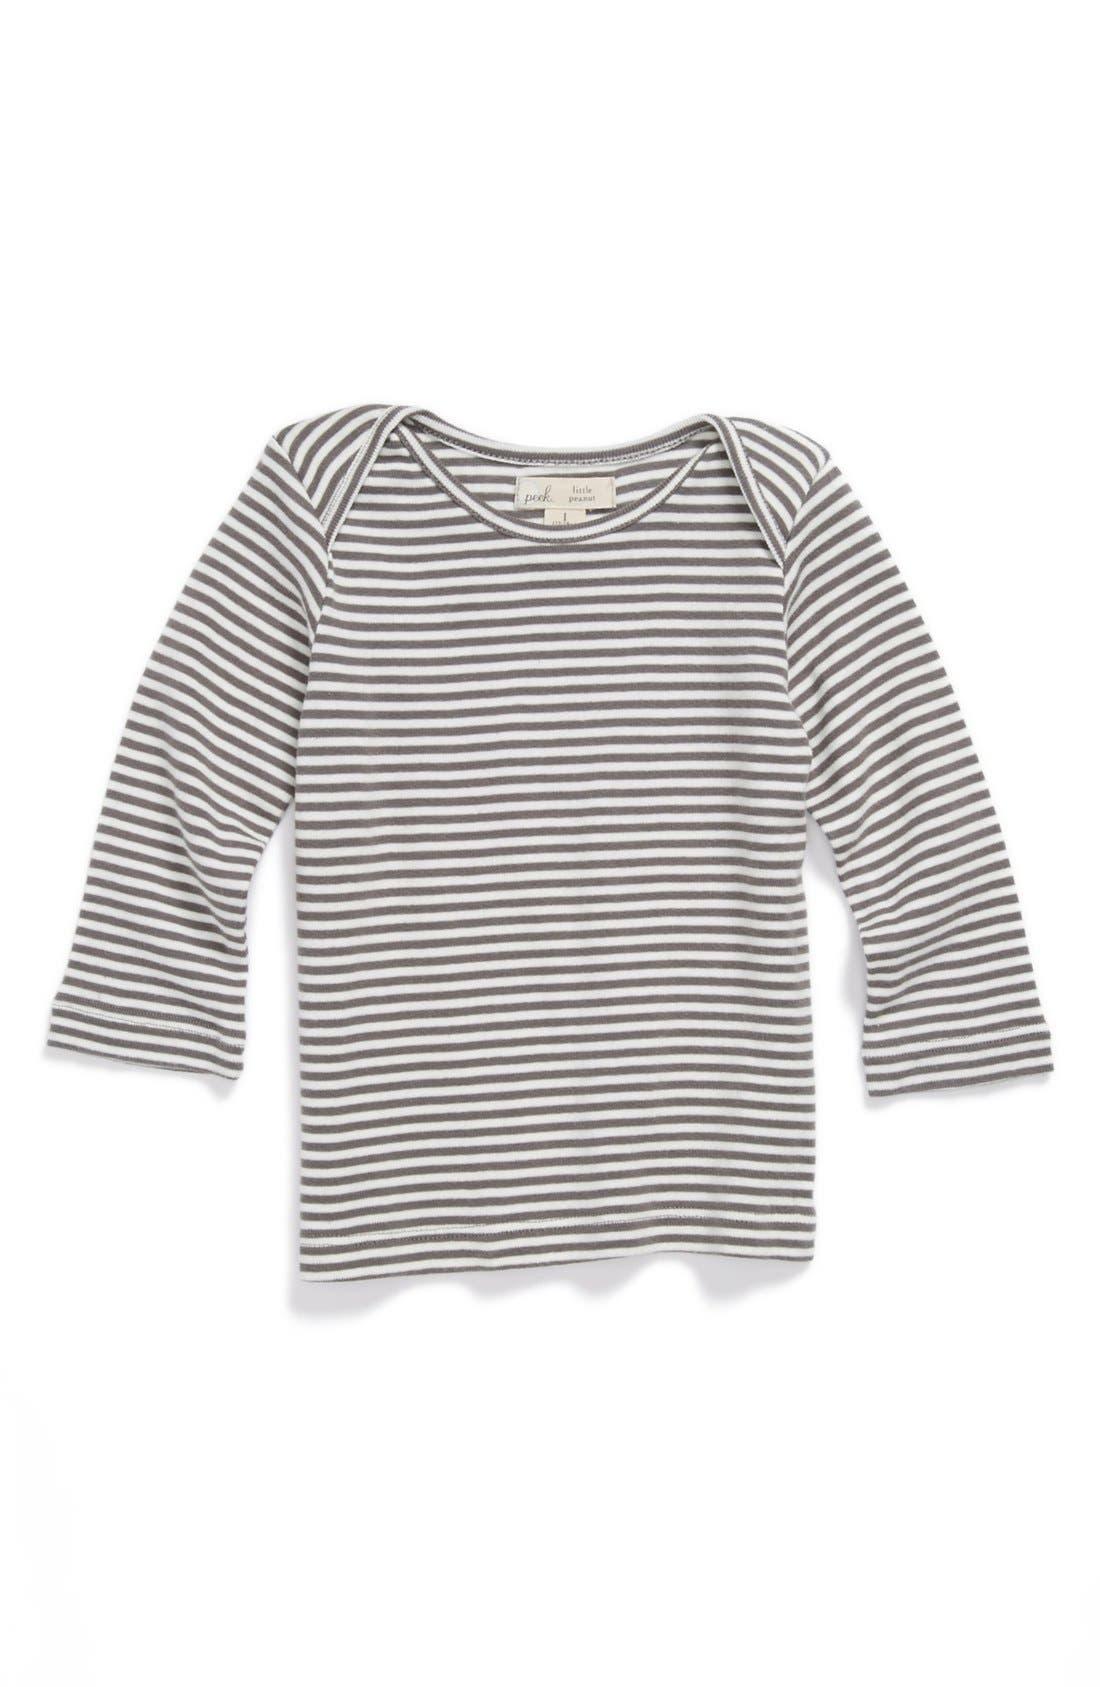 Alternate Image 1 Selected - Peek 'Little Peanut - Alphie' T-Shirt (Baby)